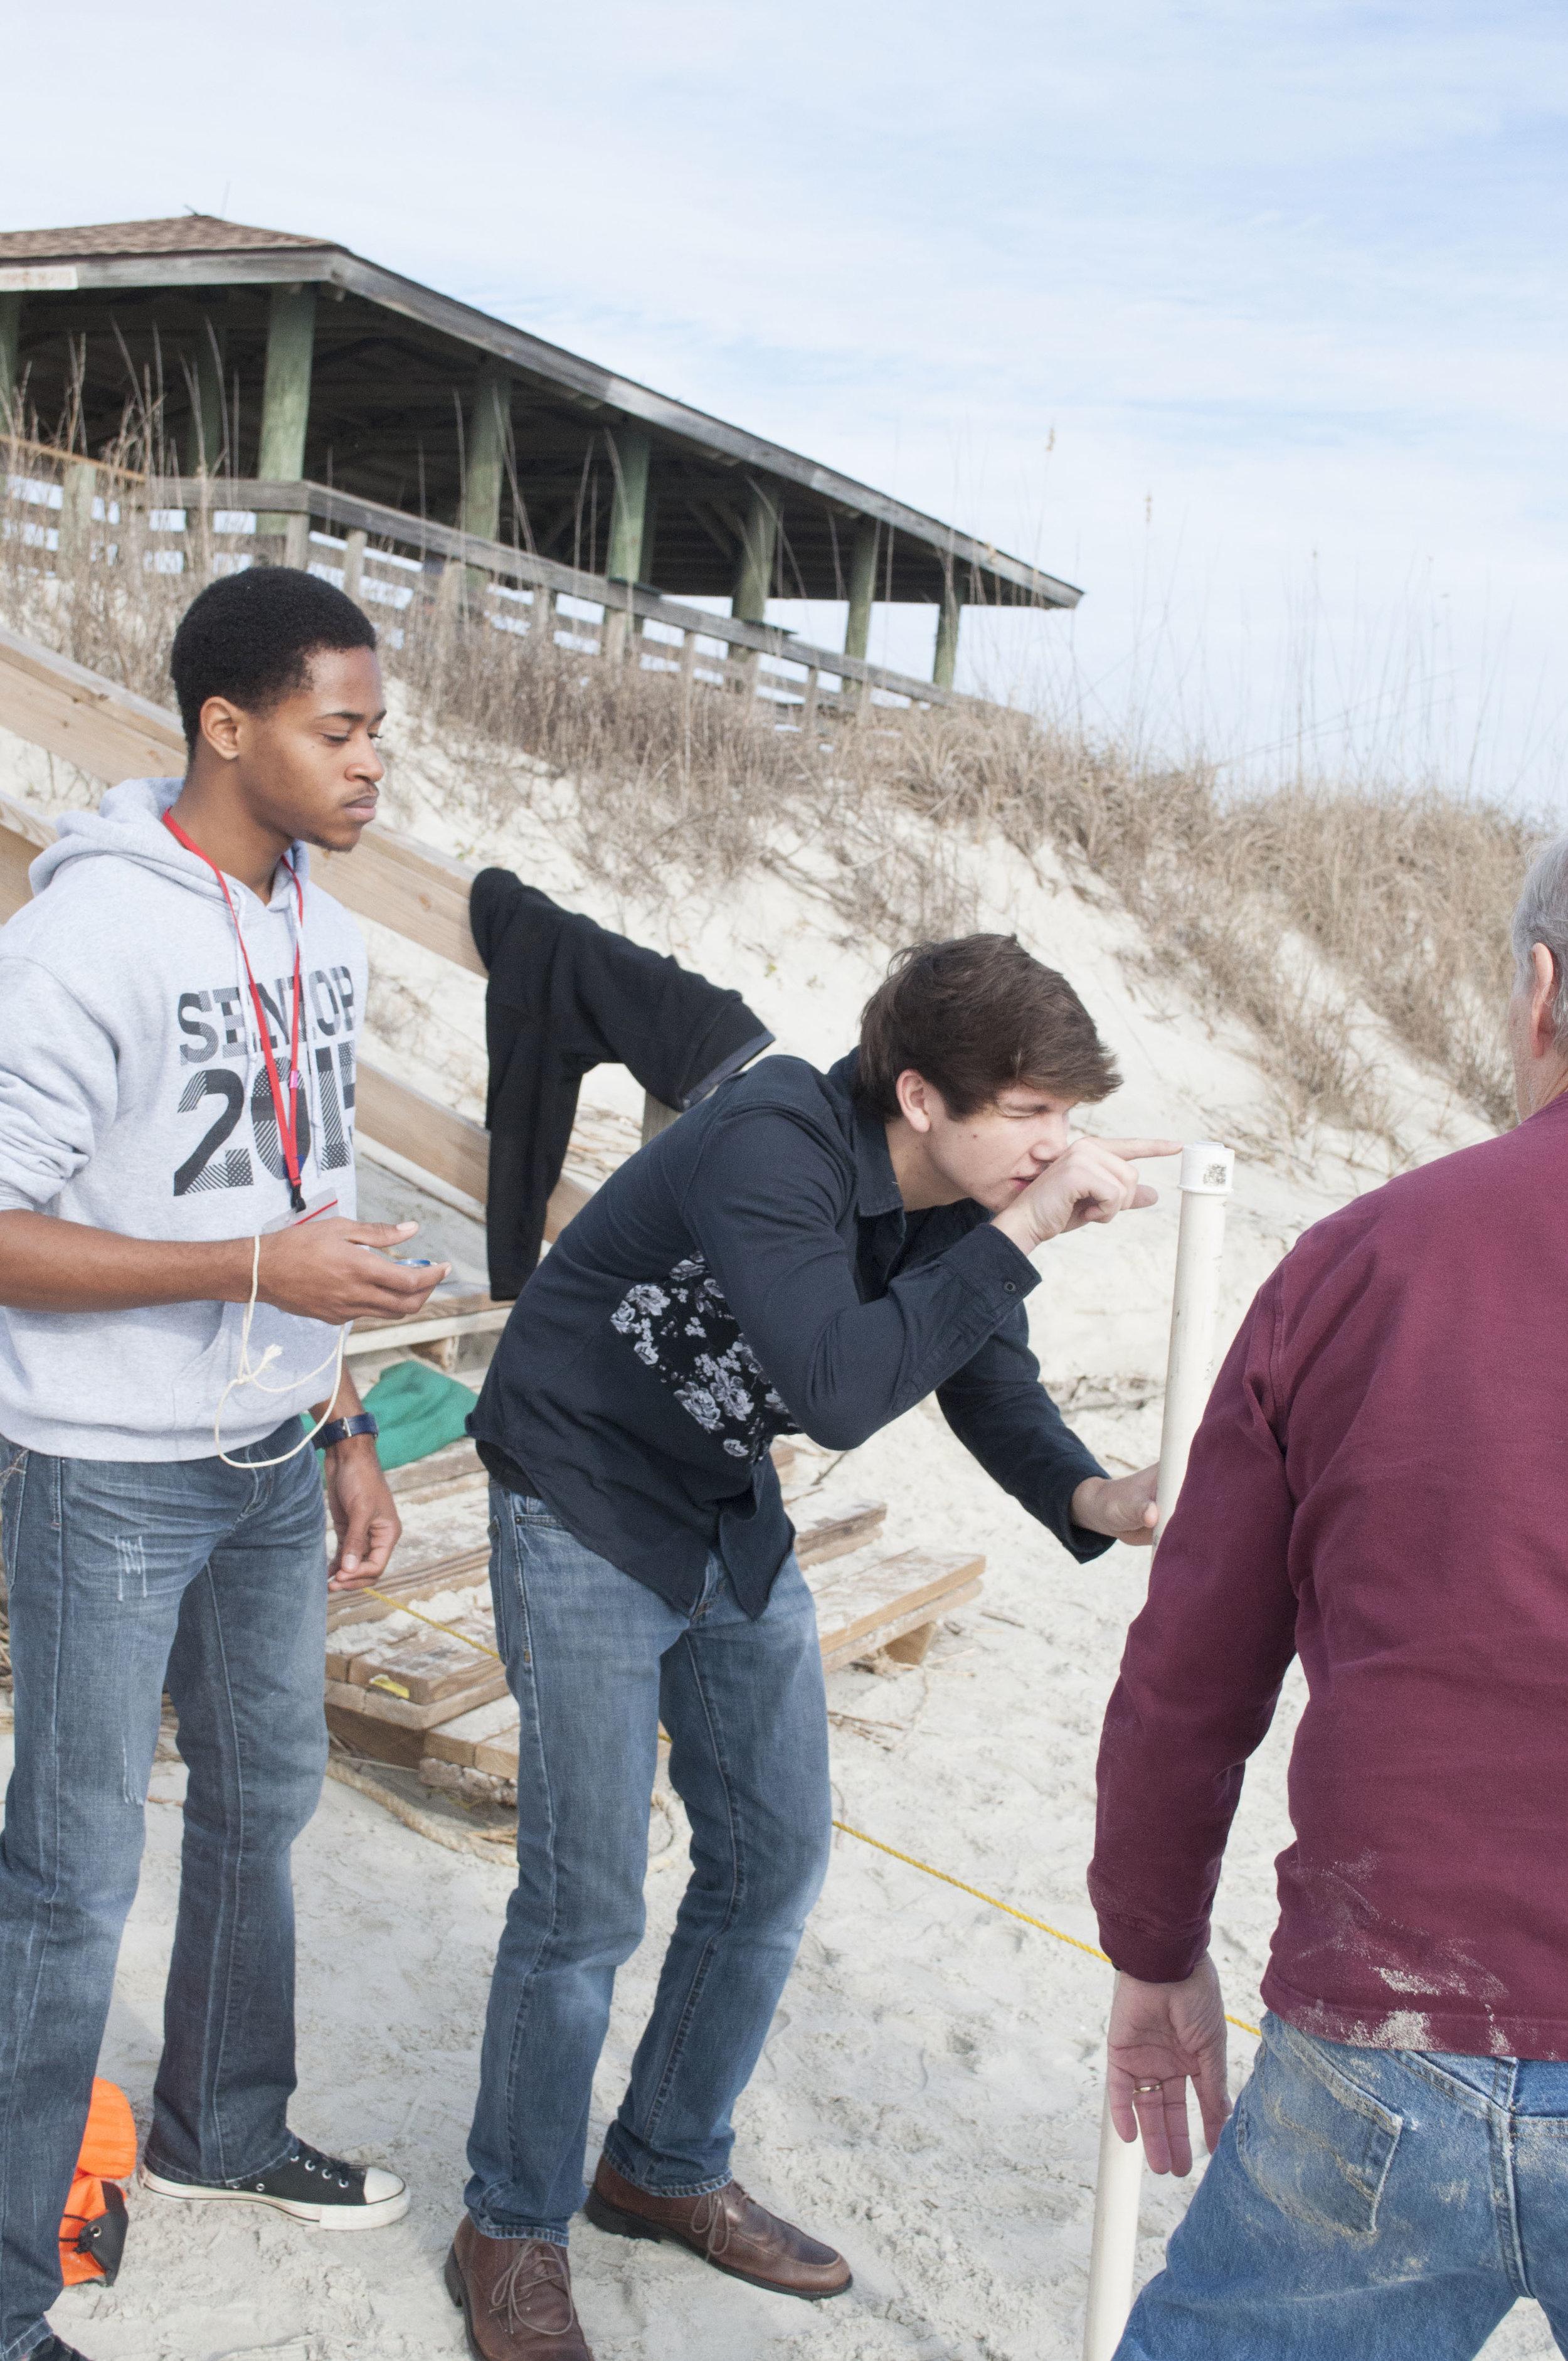 BEACH SLOPE MONITORING